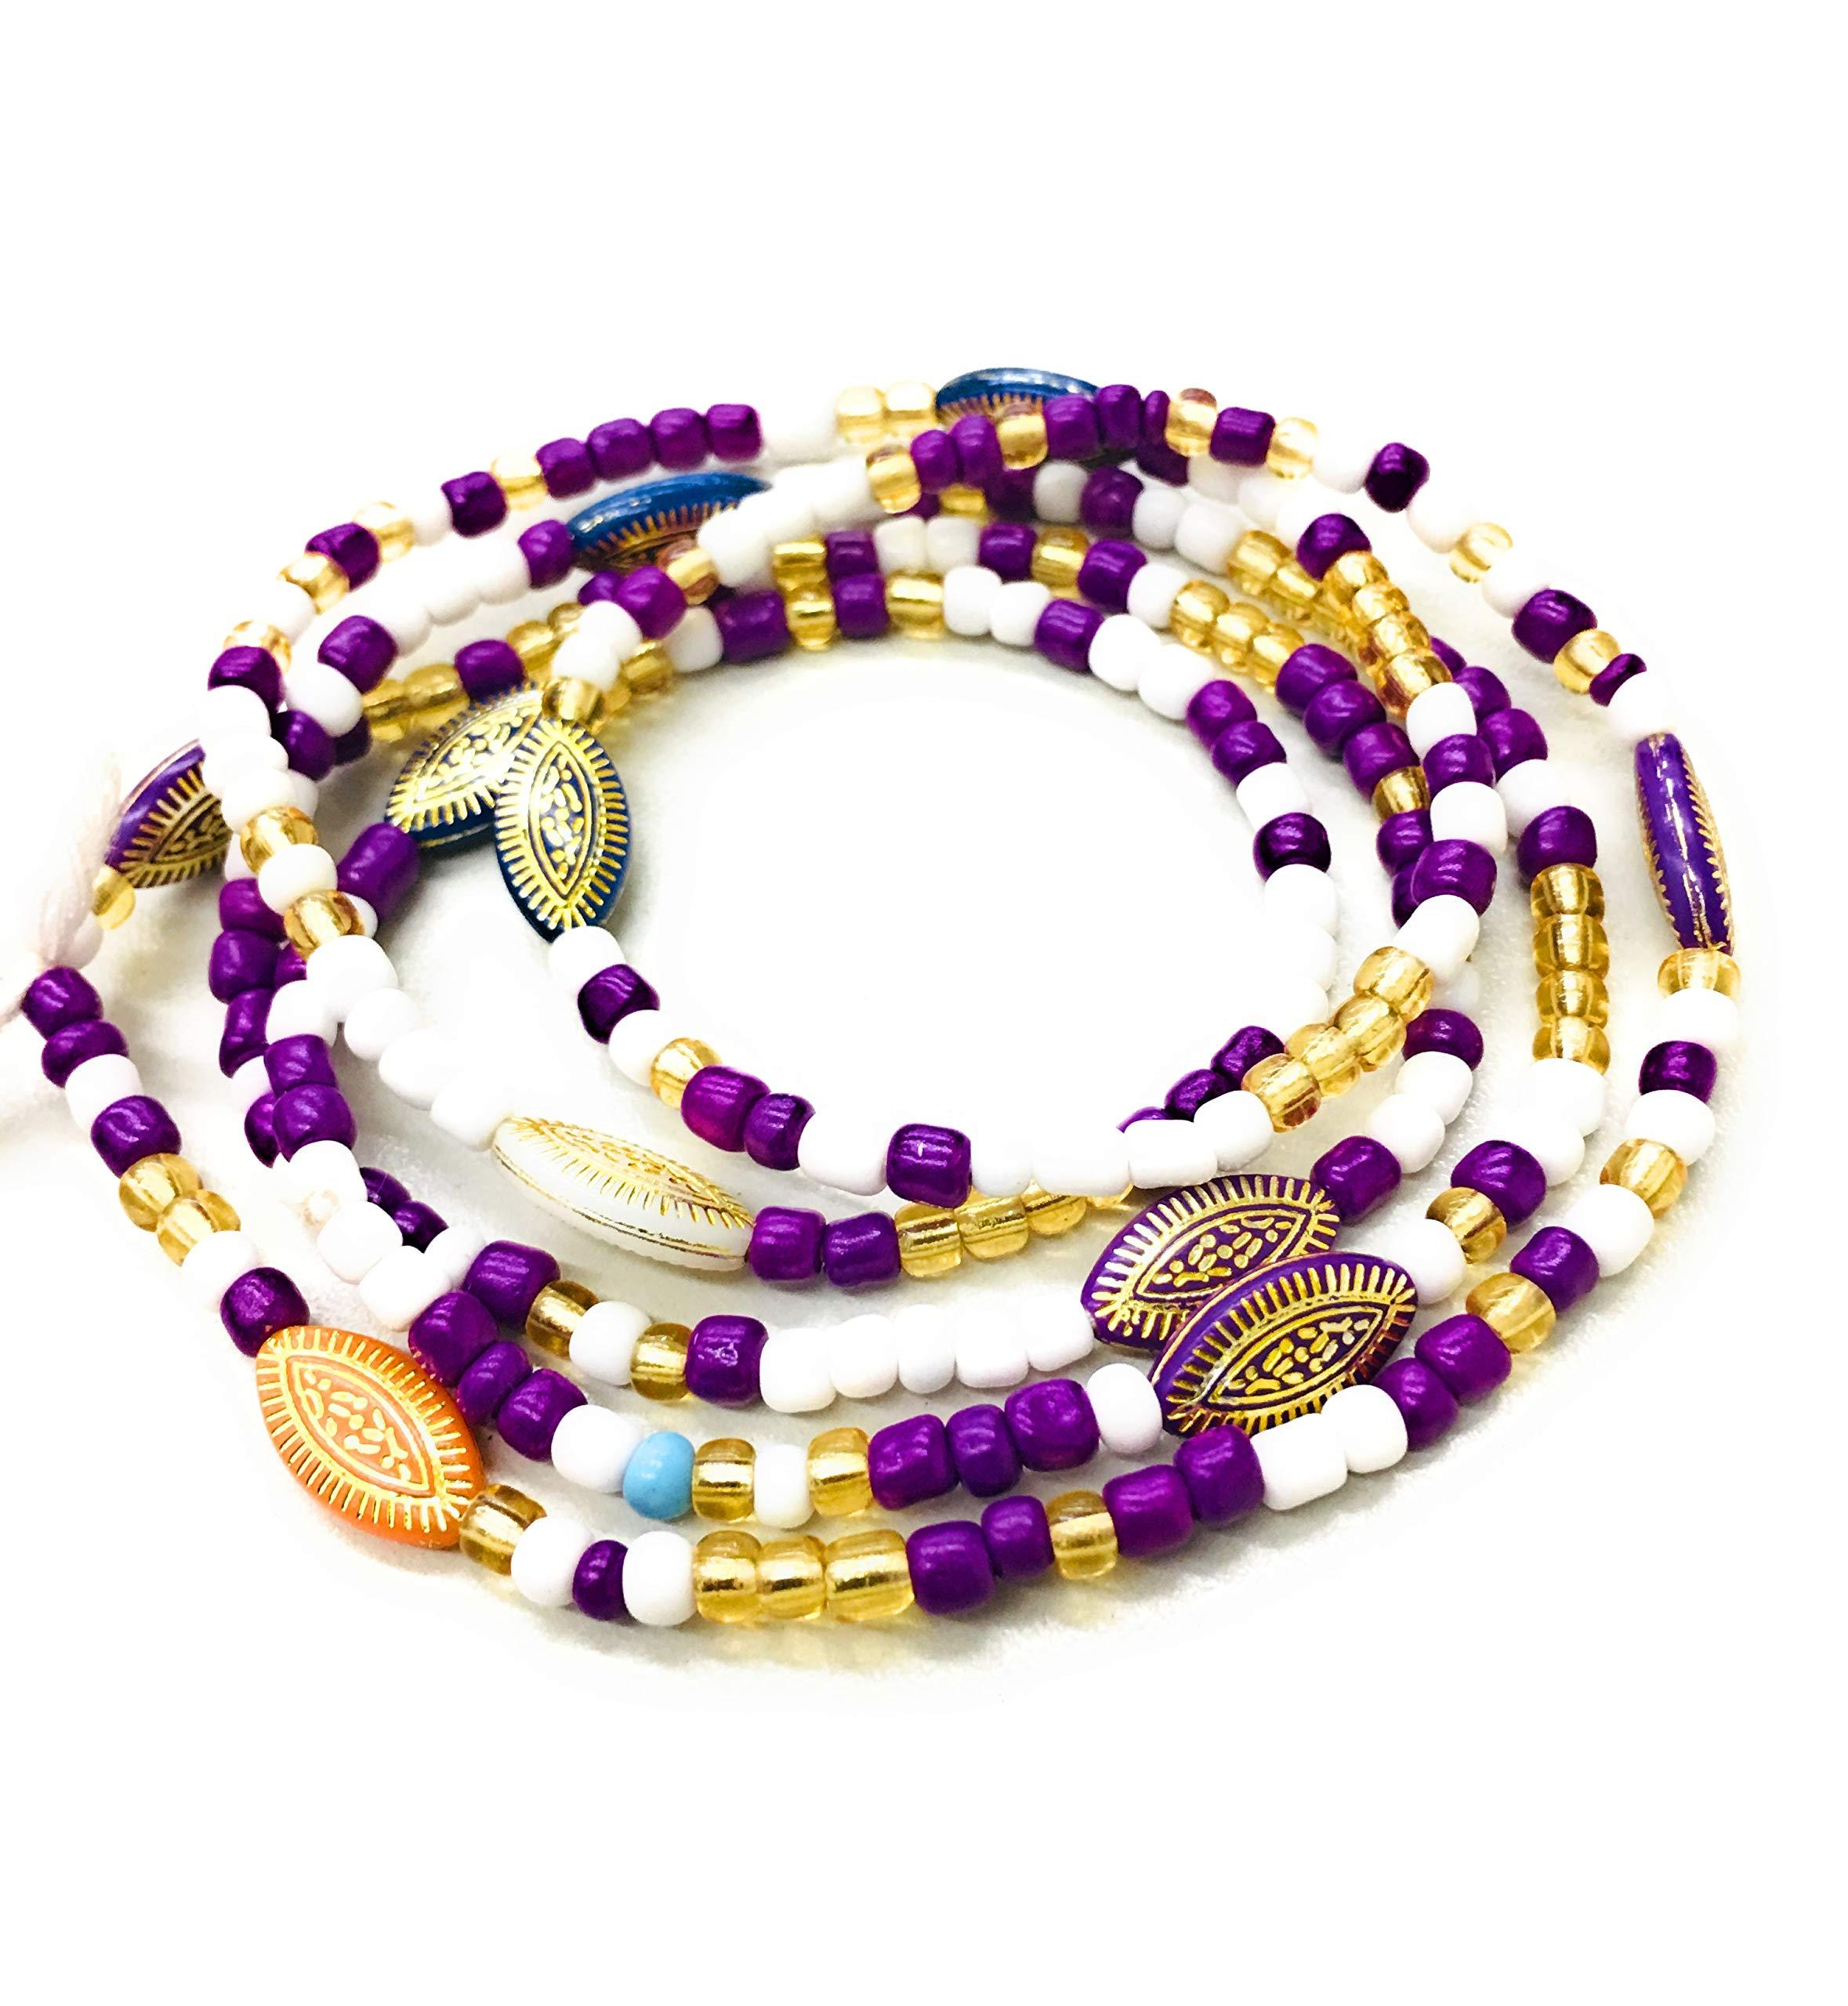 Purple White Waist Beads African Waist Bead Ghana Waist Beads Tribal Waist Beads Tie On Made With Thread Buy Online In El Salvador At Elsalvador Desertcart Com Productid 121347294